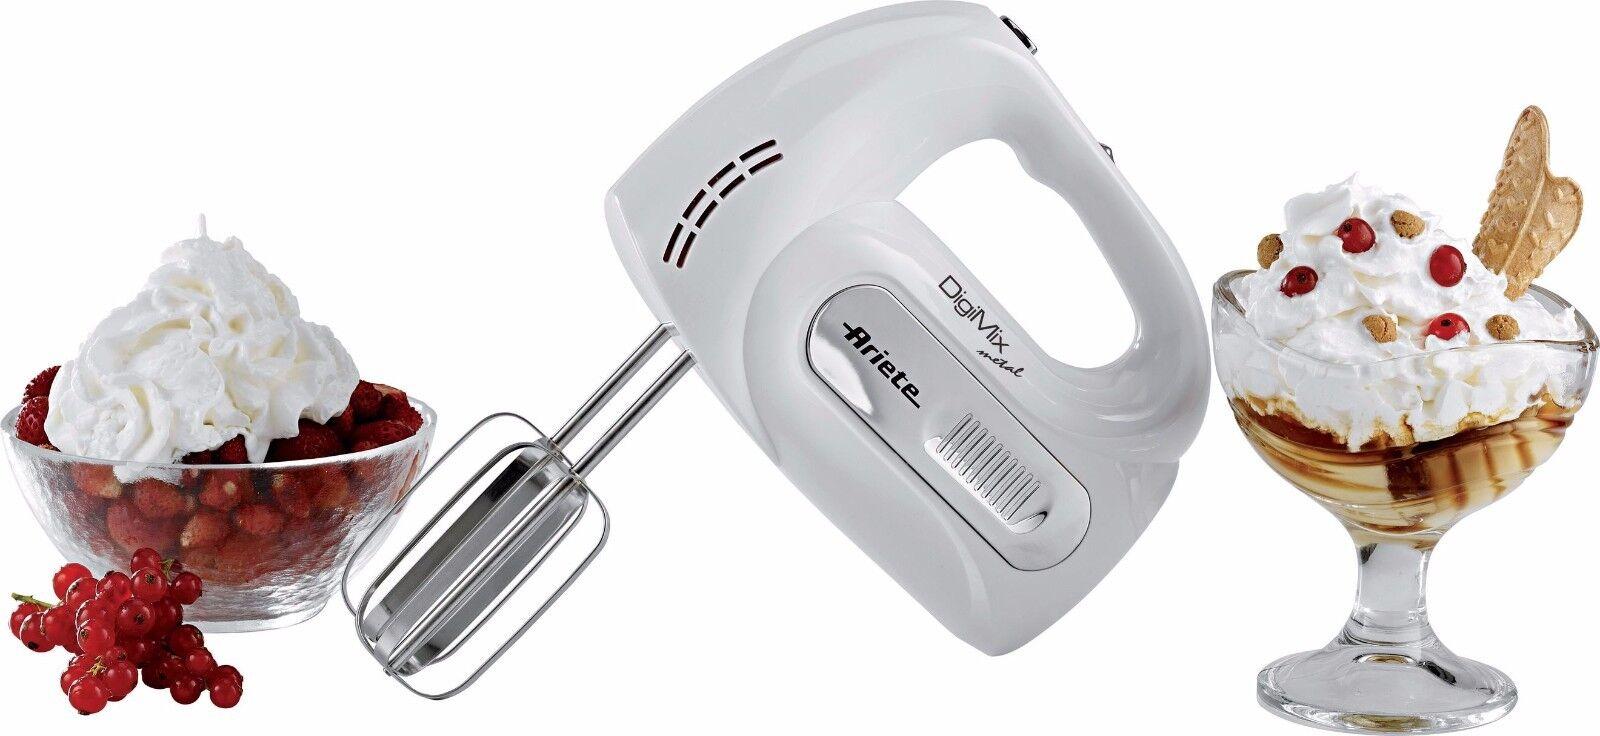 Ariete 1568 Digimix Metal Electric Hand mixer whisk blender 300W